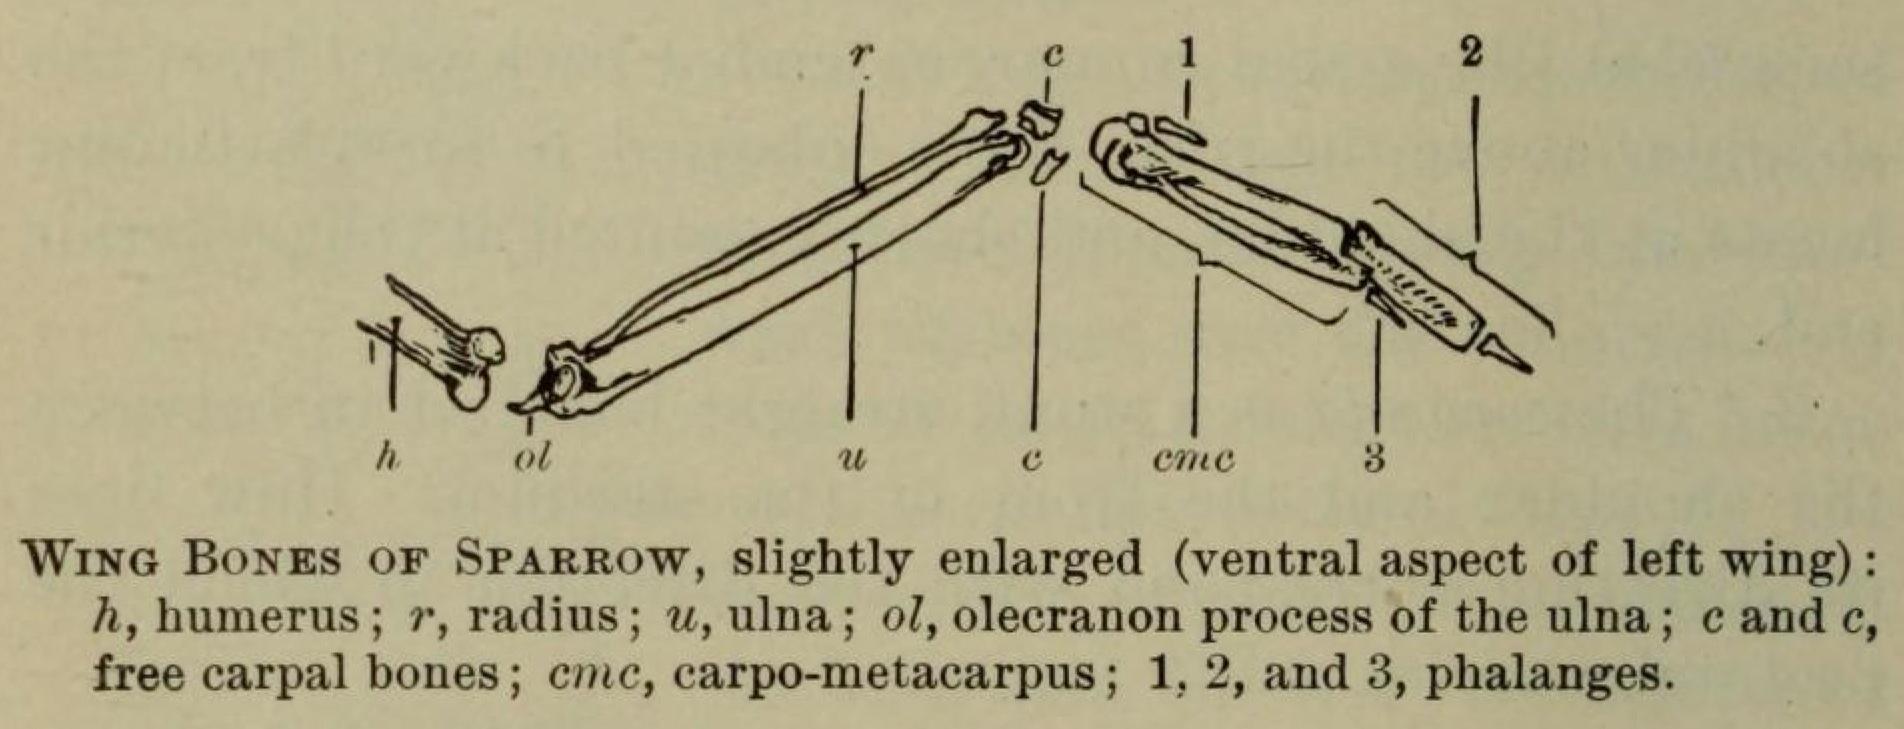 Wing_Bones_of_Sparrow file wing bones of sparrow jpg wikimedia commons